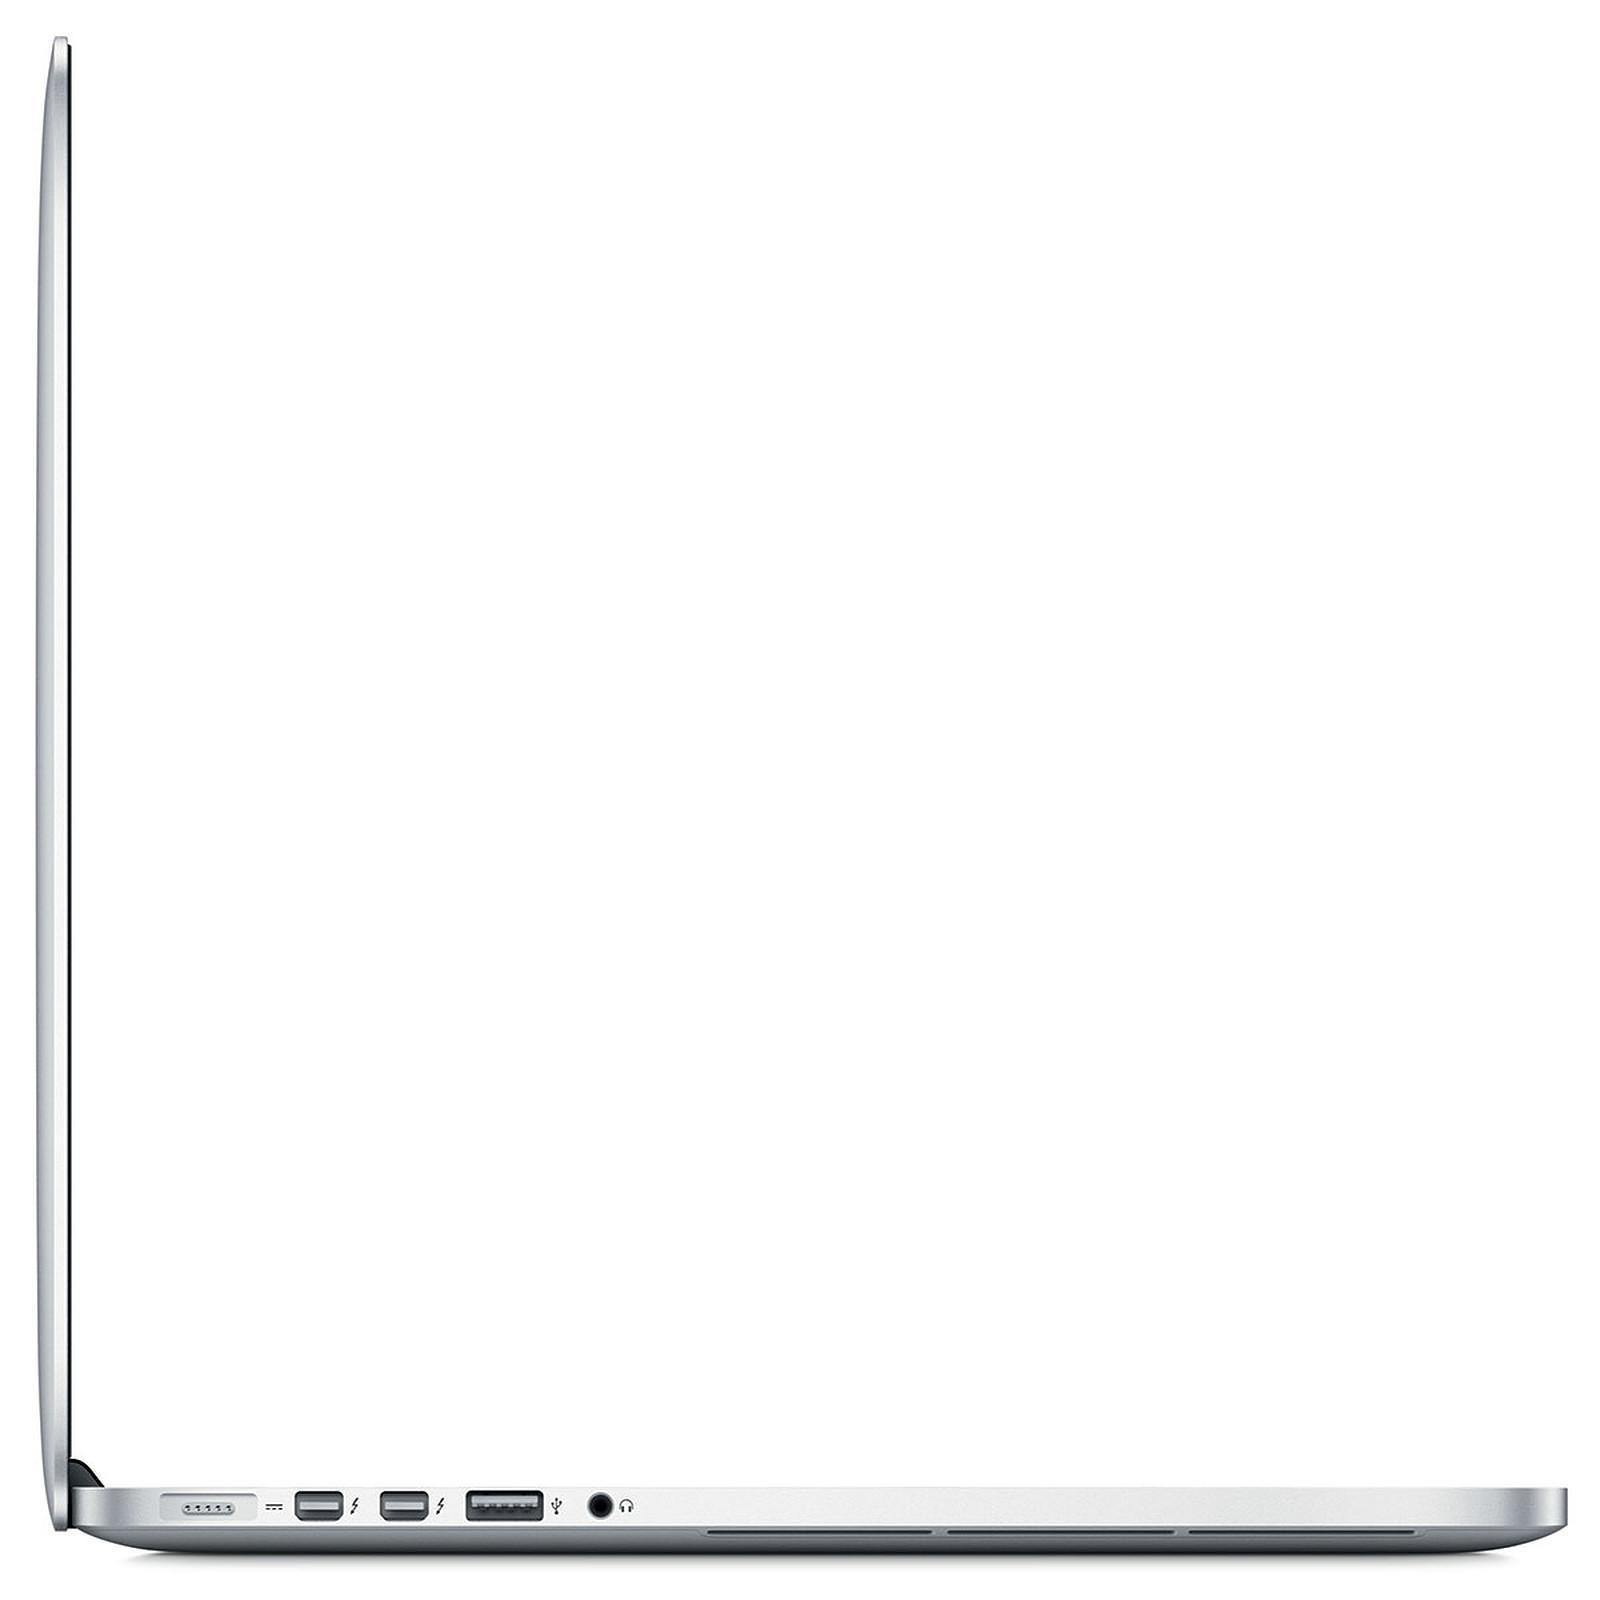 MacBook Pro Retina 15.4-inch (2013) - Core i7 - 16GB - SSD 256 GB